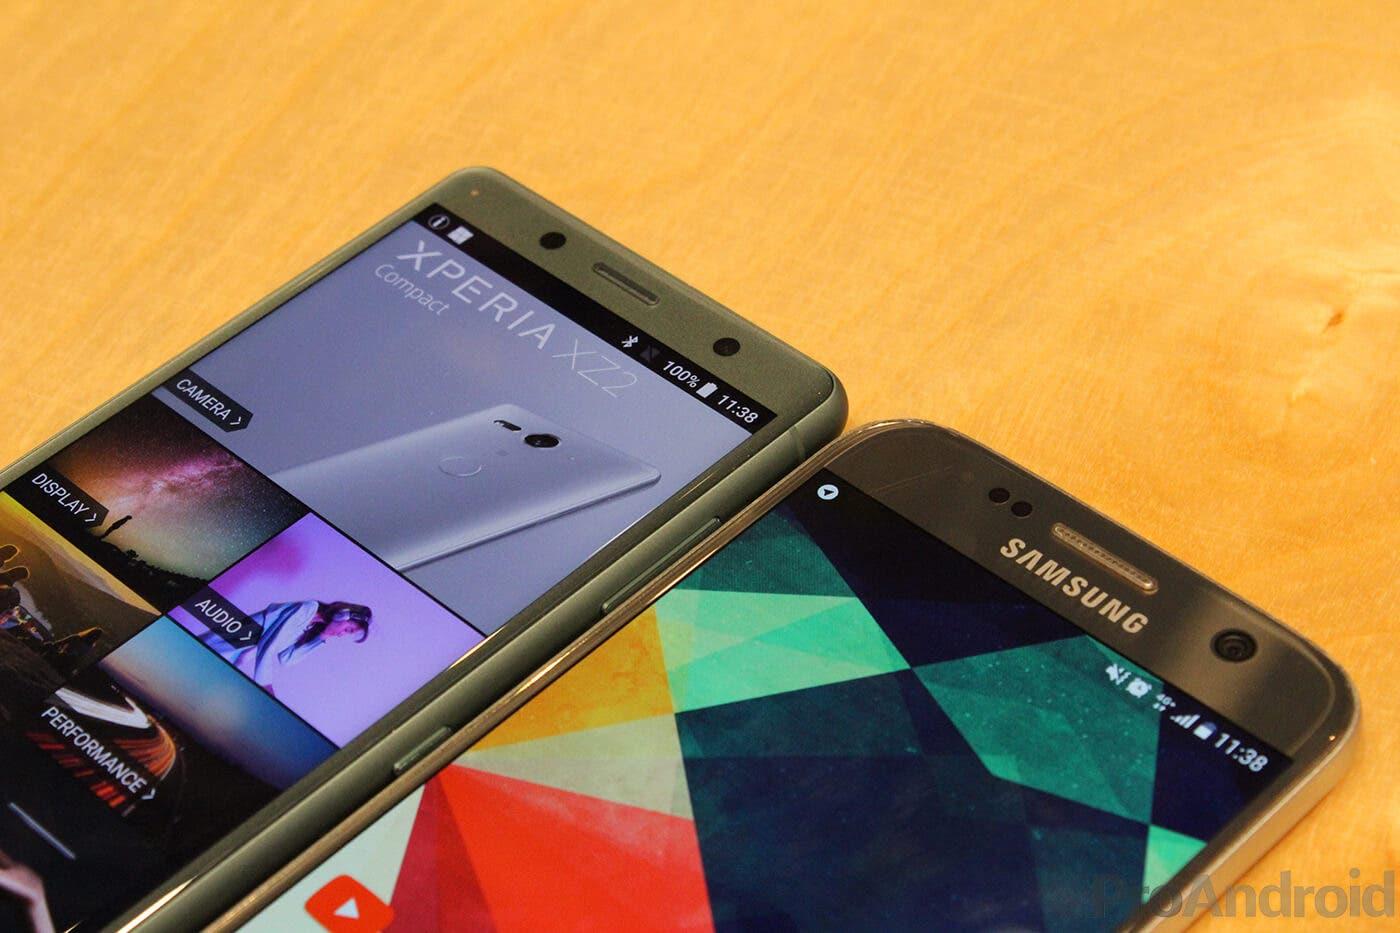 Moderno Marco De Sony S 7 Pulgadas Viñeta - Ideas Personalizadas de ...